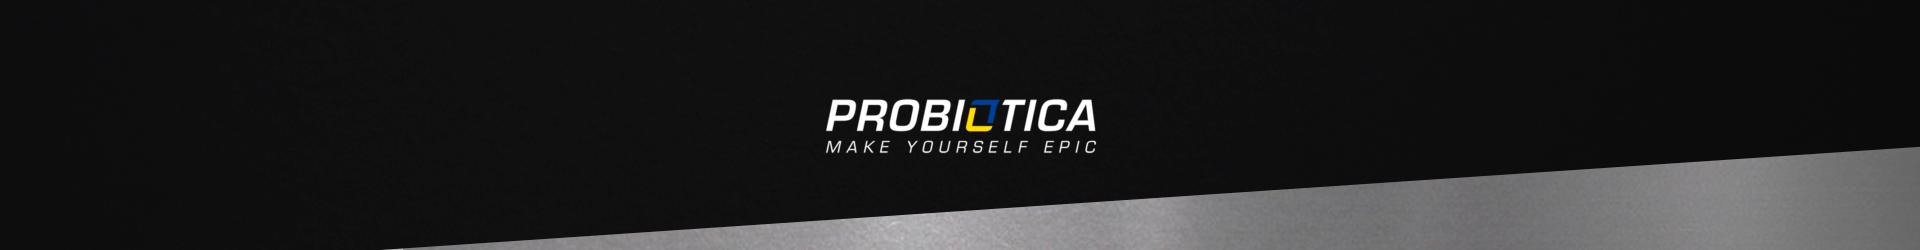 MARCA - Probiótica